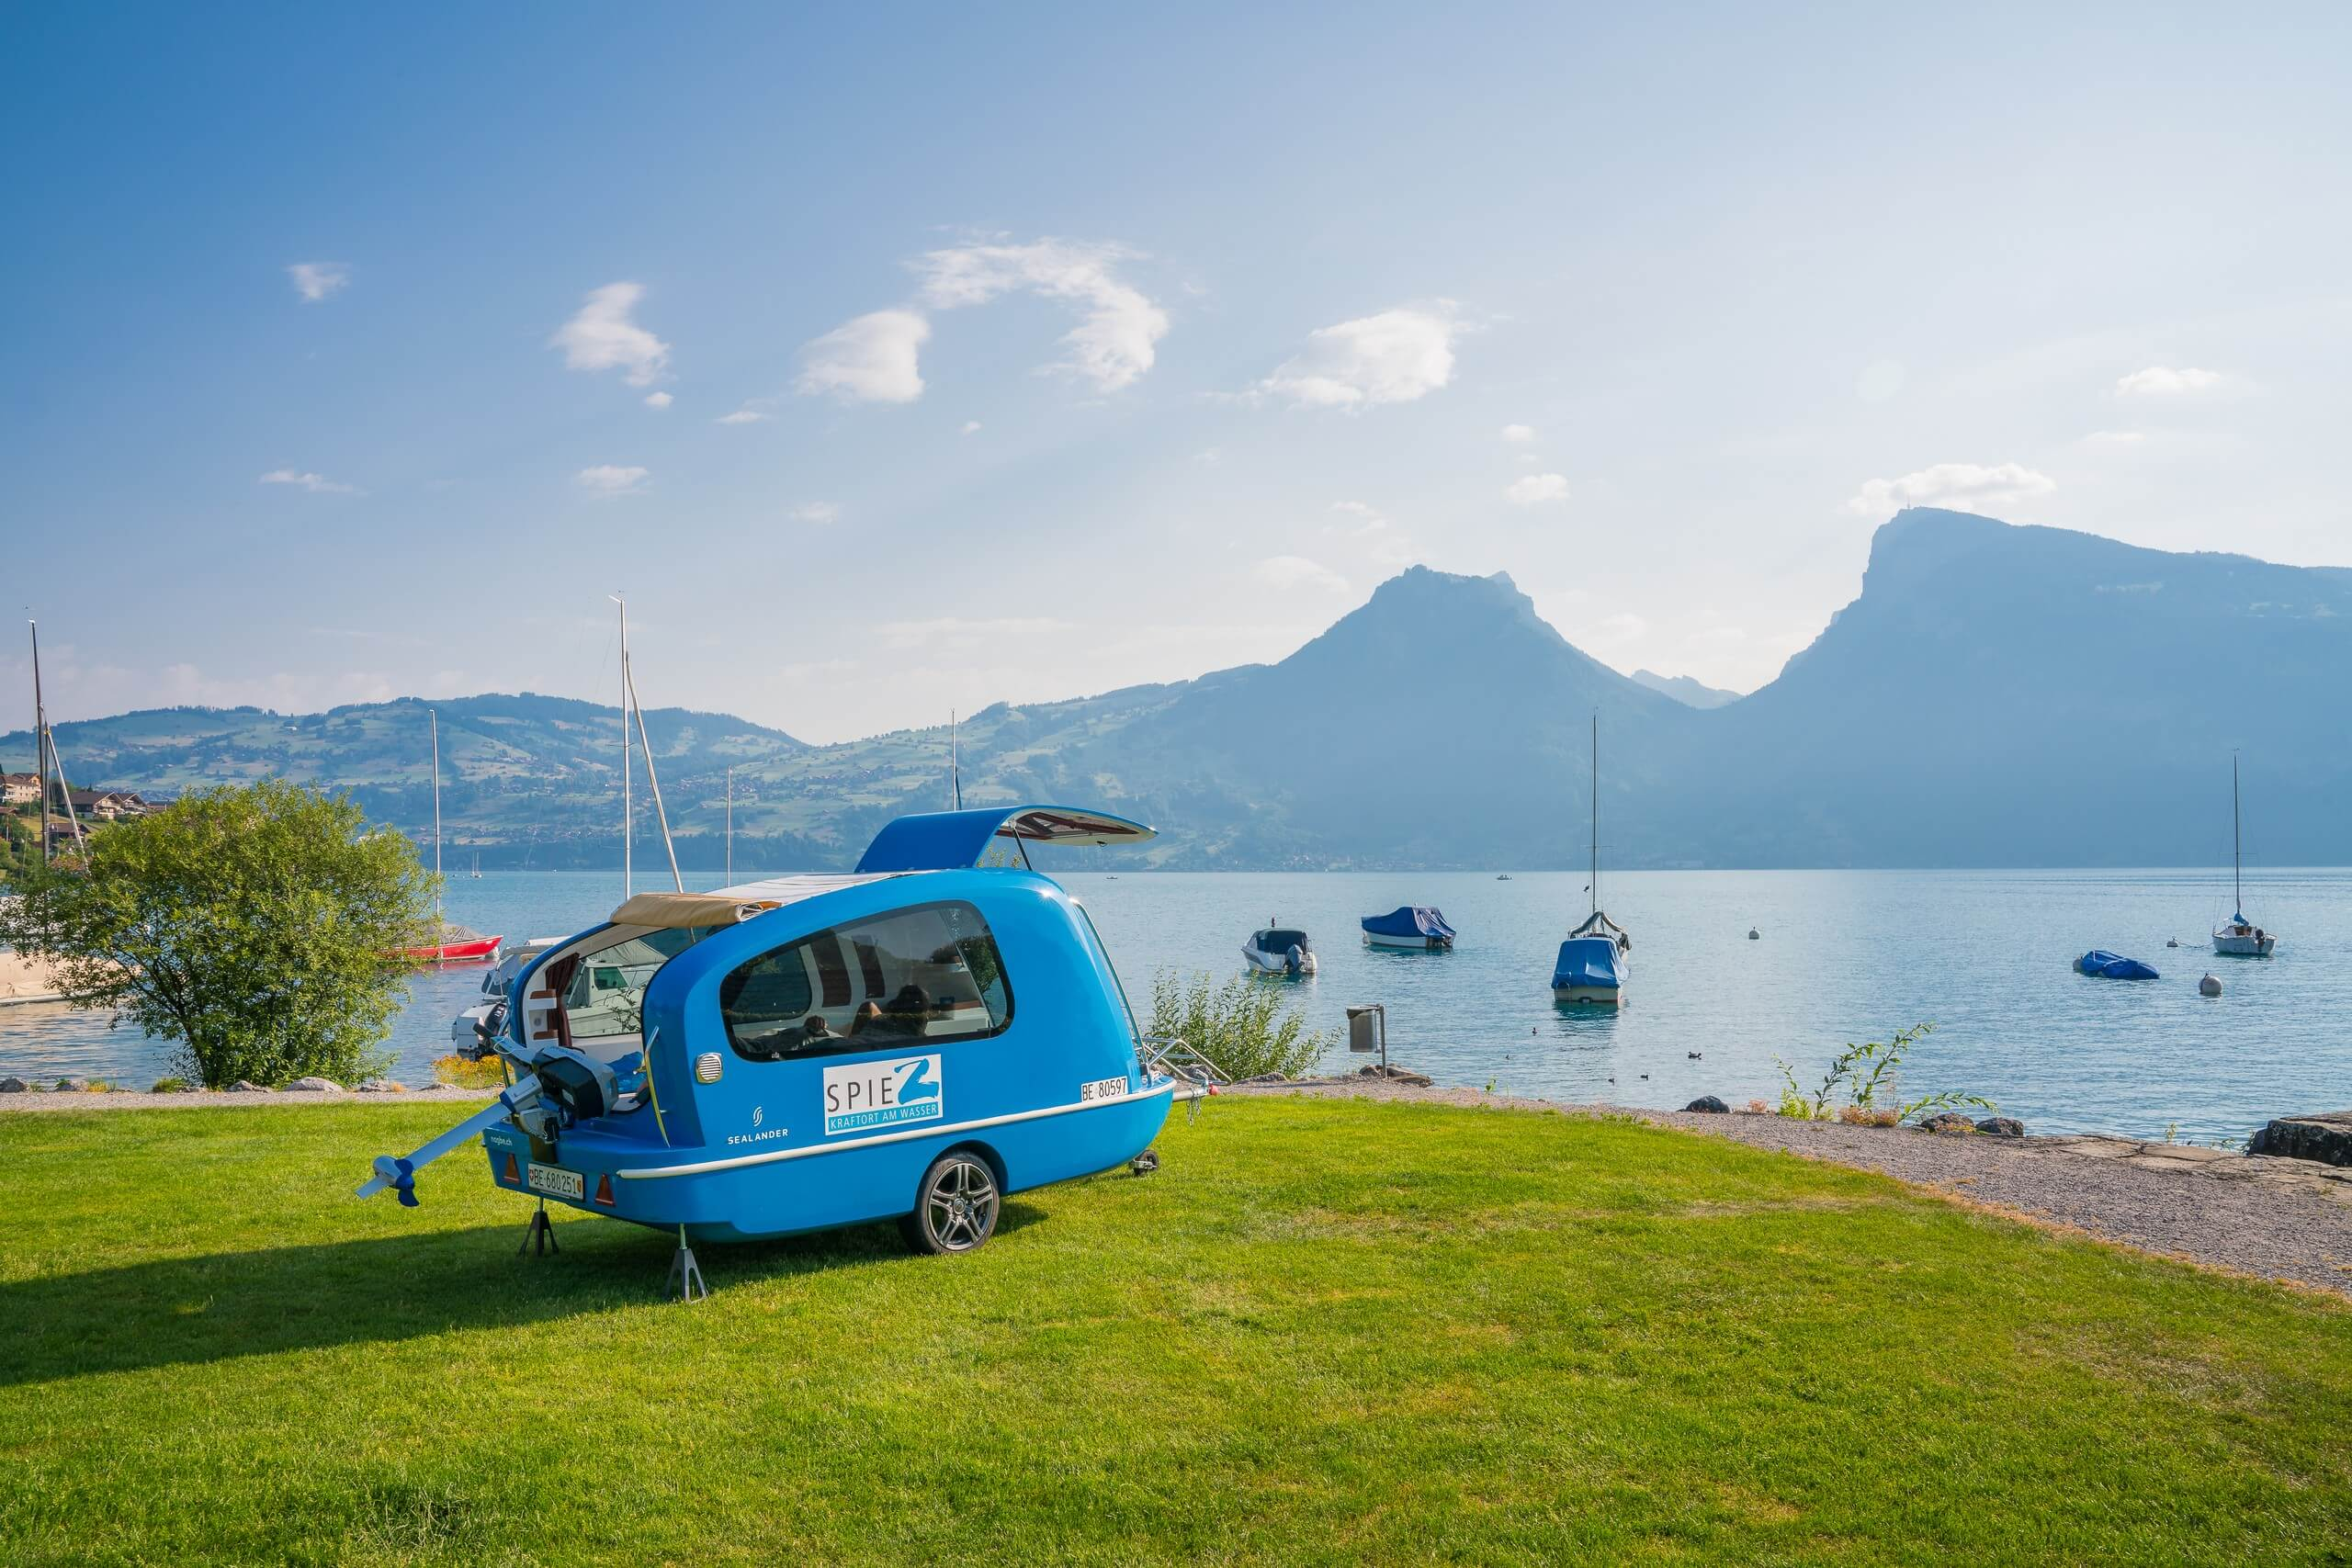 spiez-sealander-sommer-thunersee-landansicht-ausflug-bergpanorama-boot-pedalo